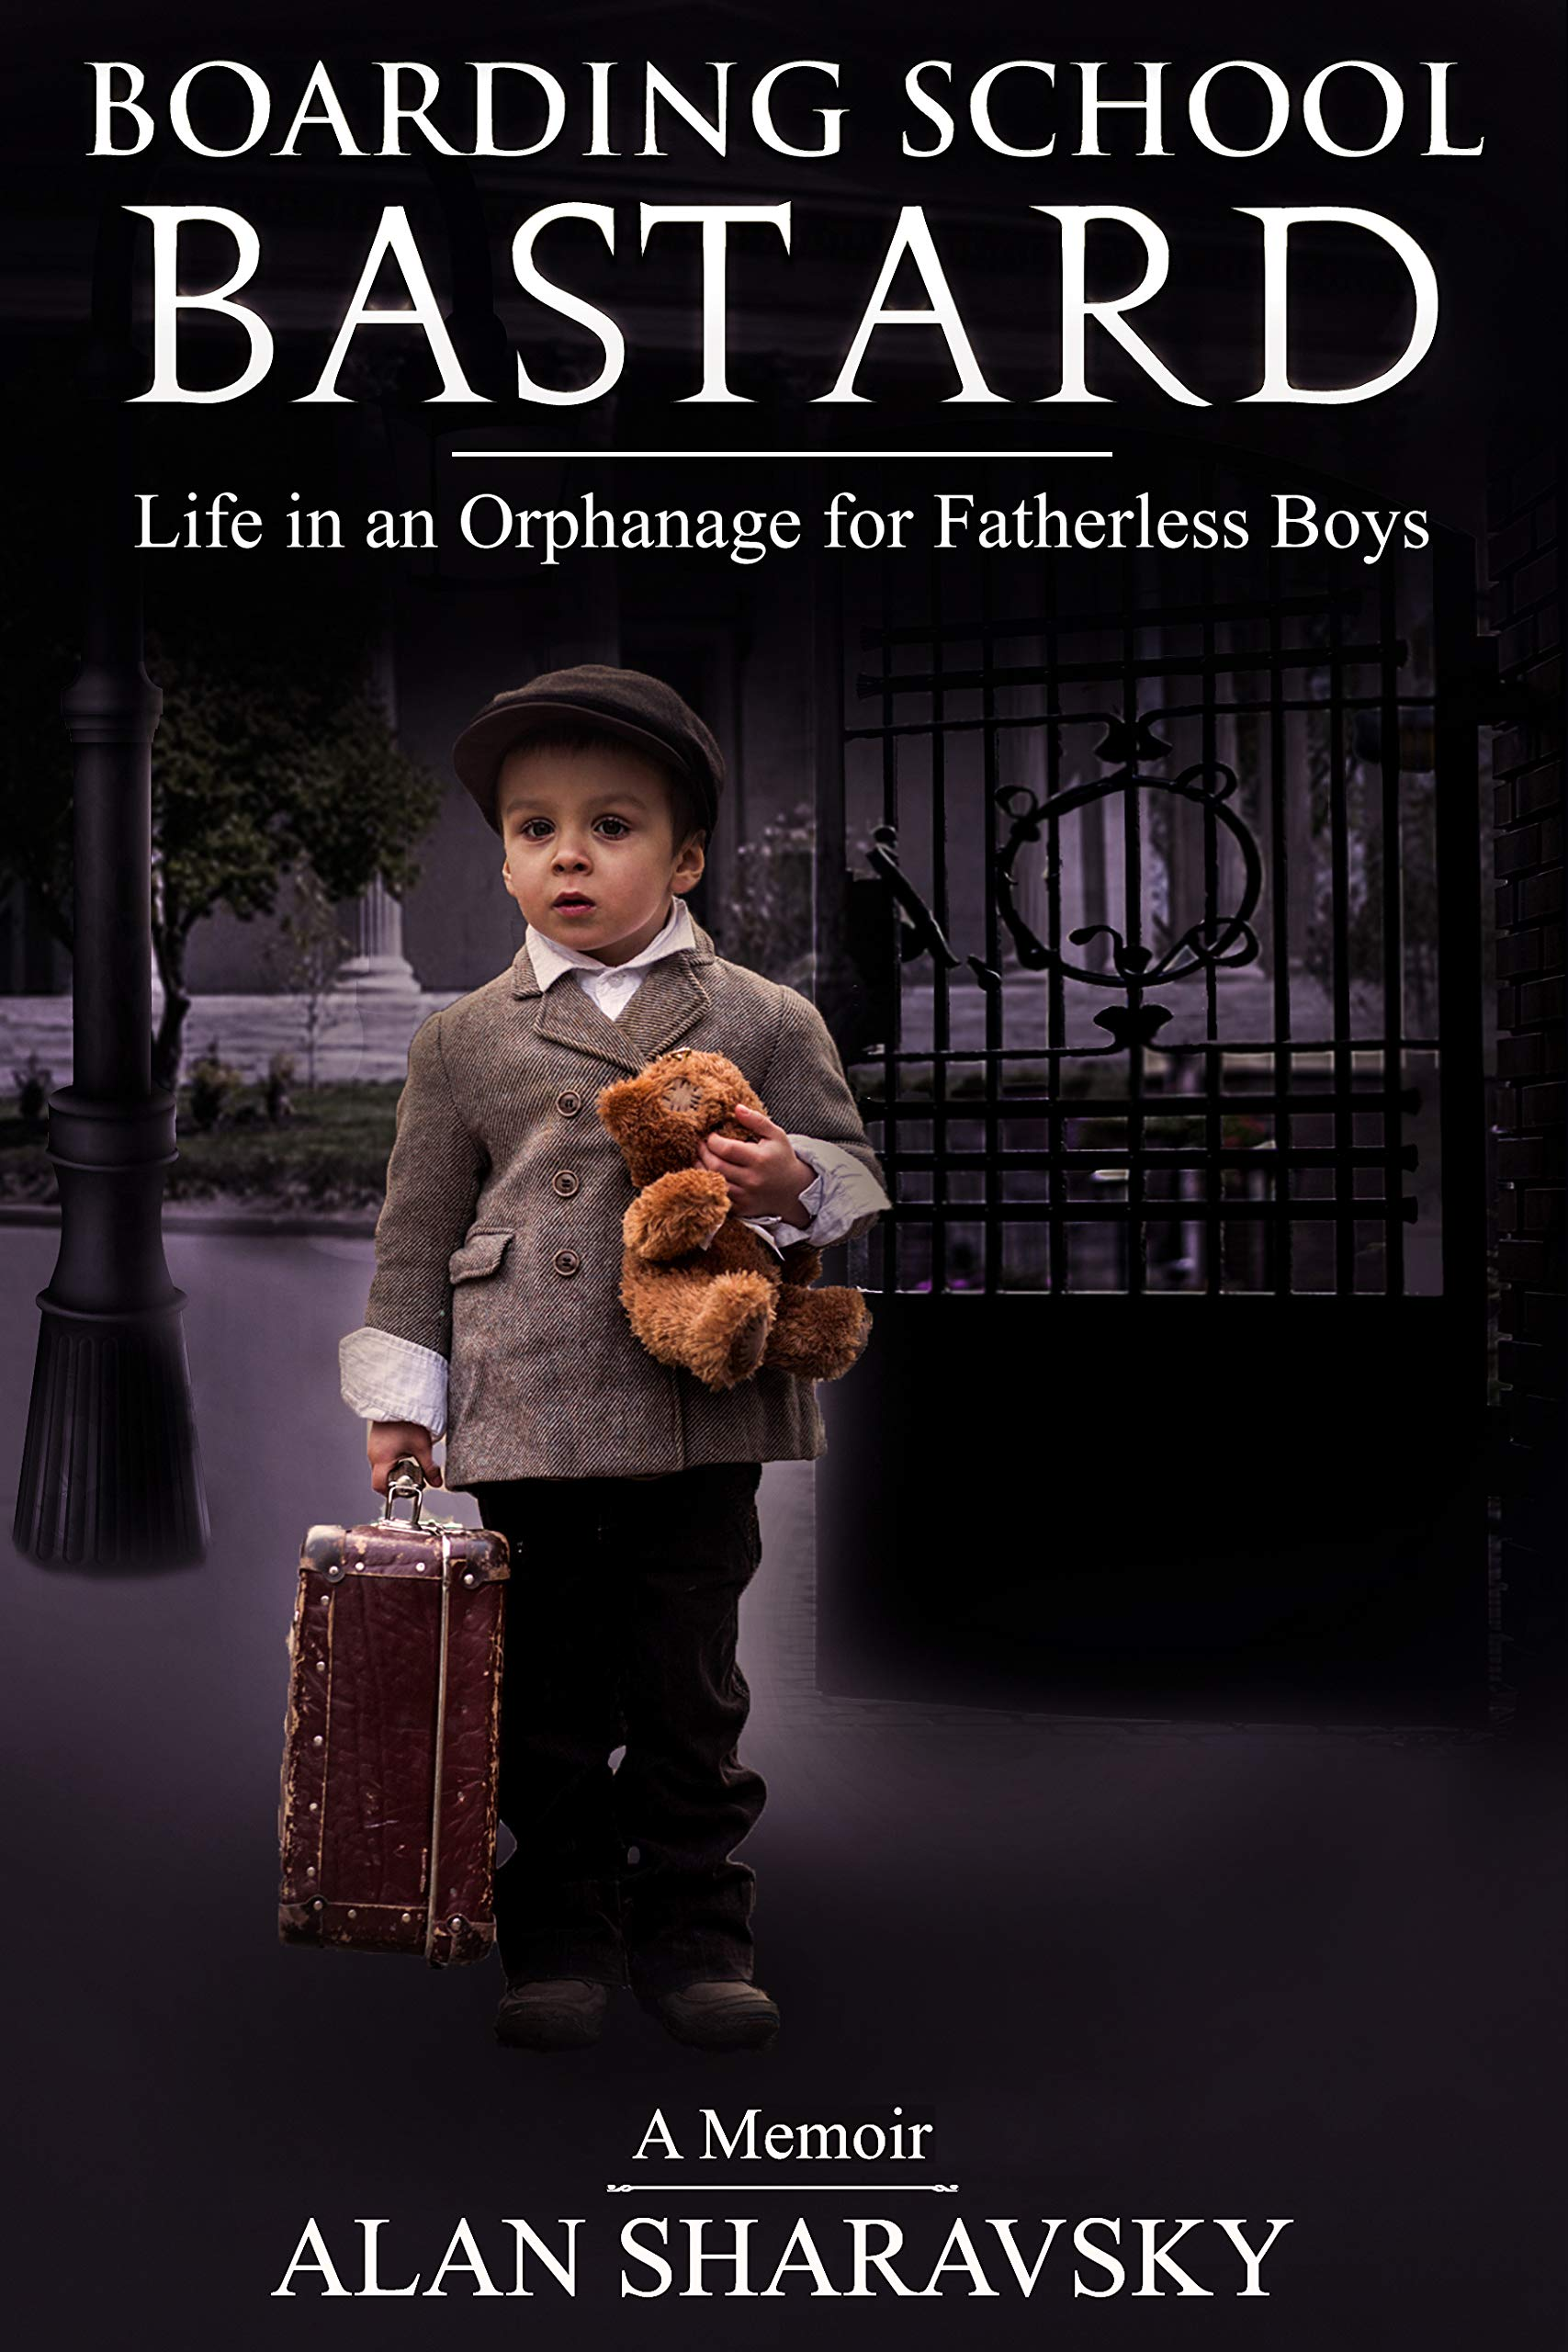 Boarding School Bastard: Life in an Orphanage for Fatherless Boys: A Memoir